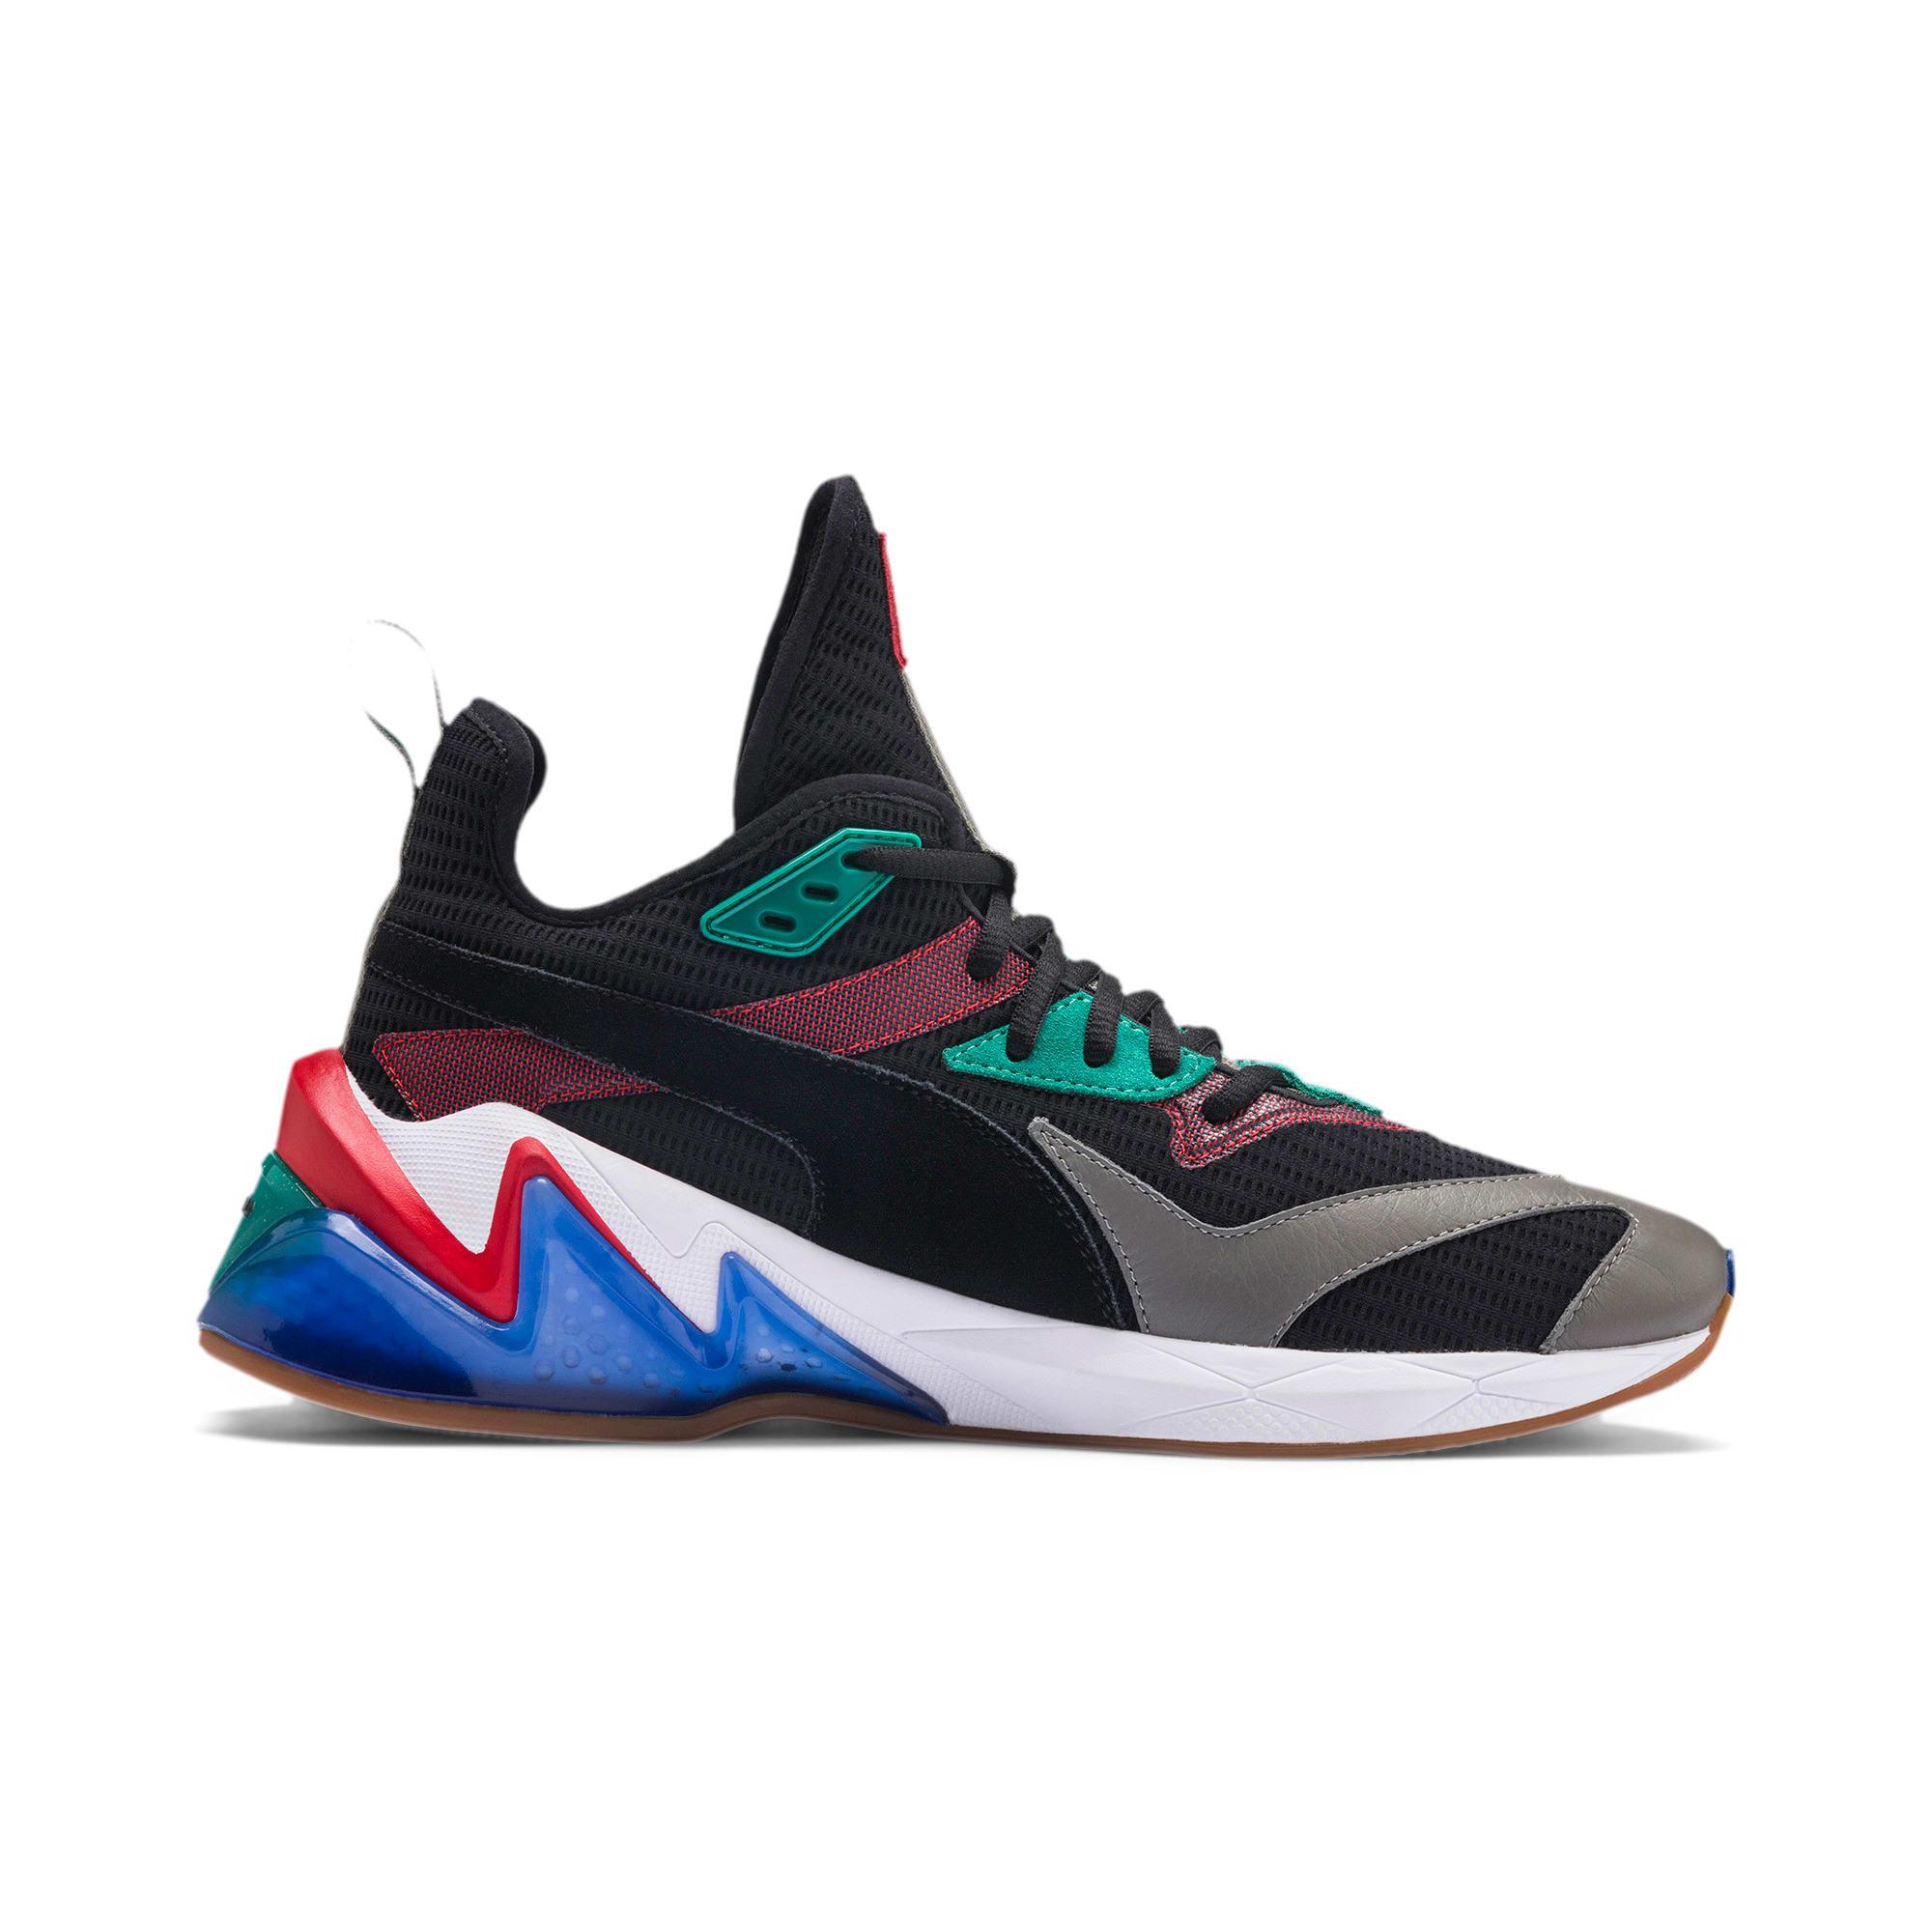 Thumbnail 5 of LQDCELL Origin Men's Training Shoes, Puma Black-Cadmium Green, medium